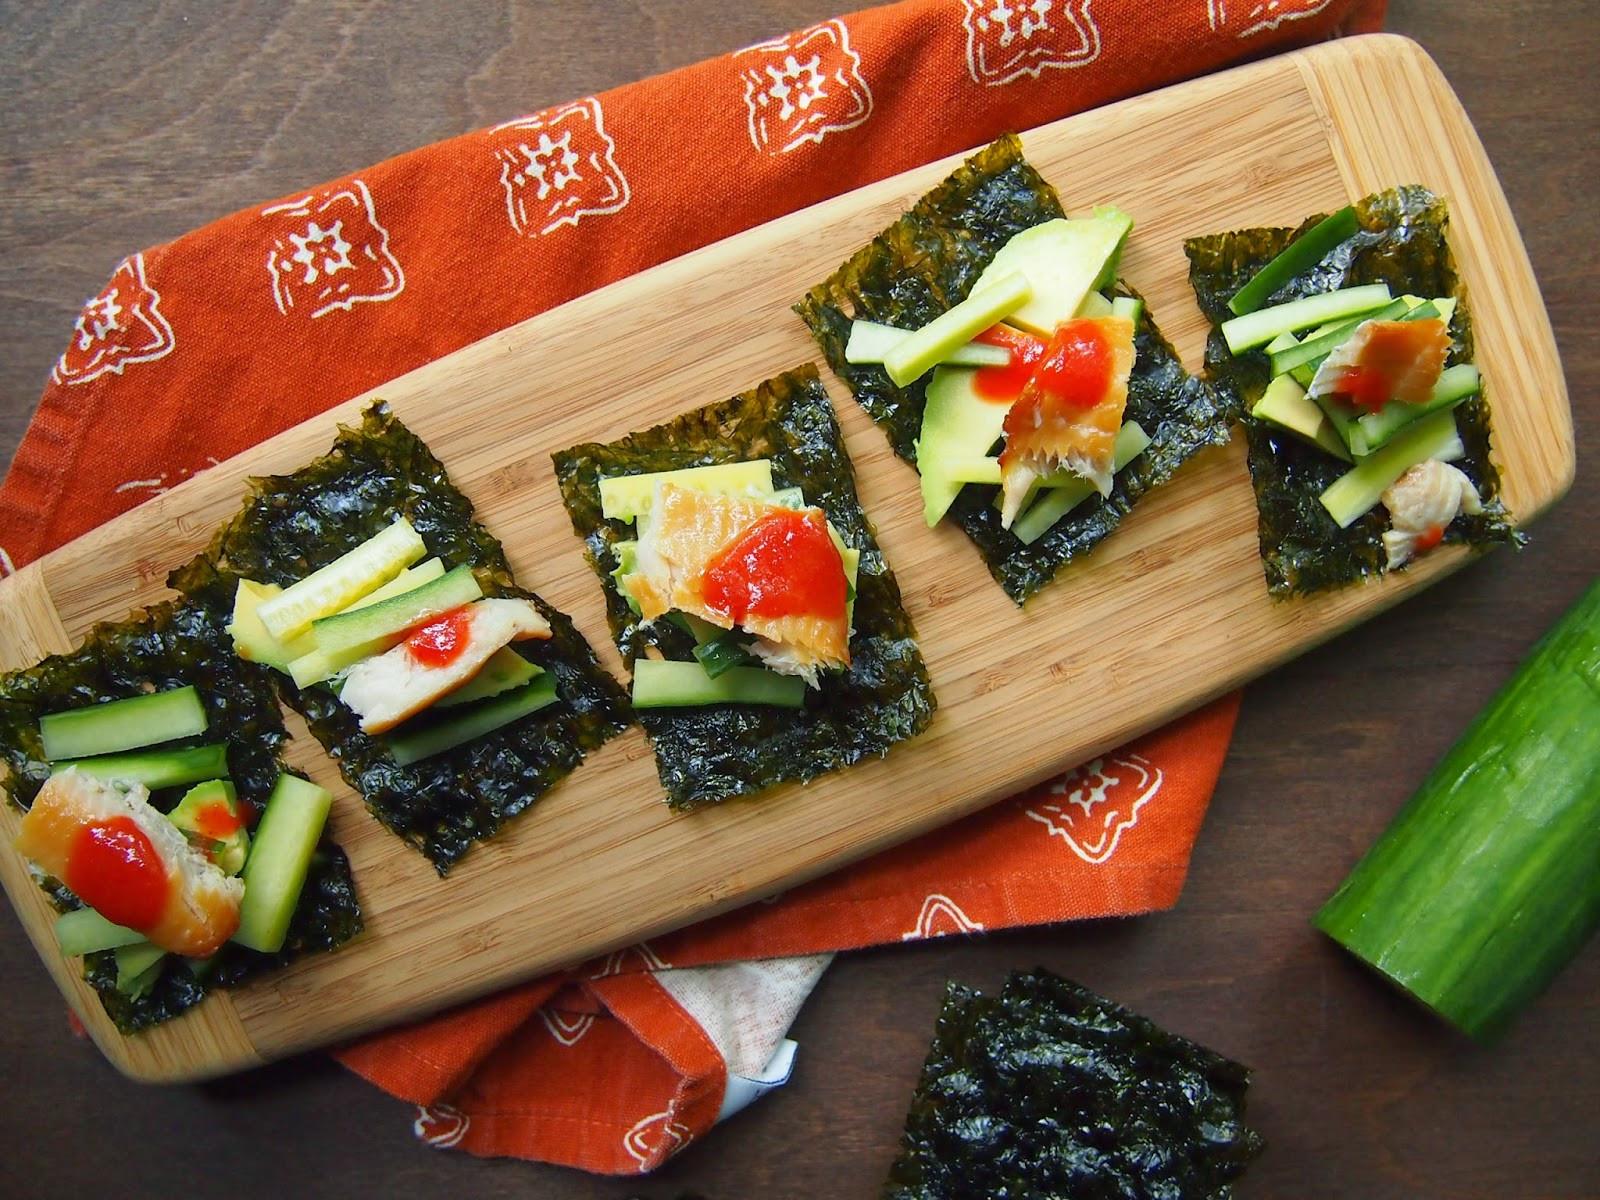 Seaweed Snacks Healthy  The Next Superfood You Should Try Seaweed Cal EZ